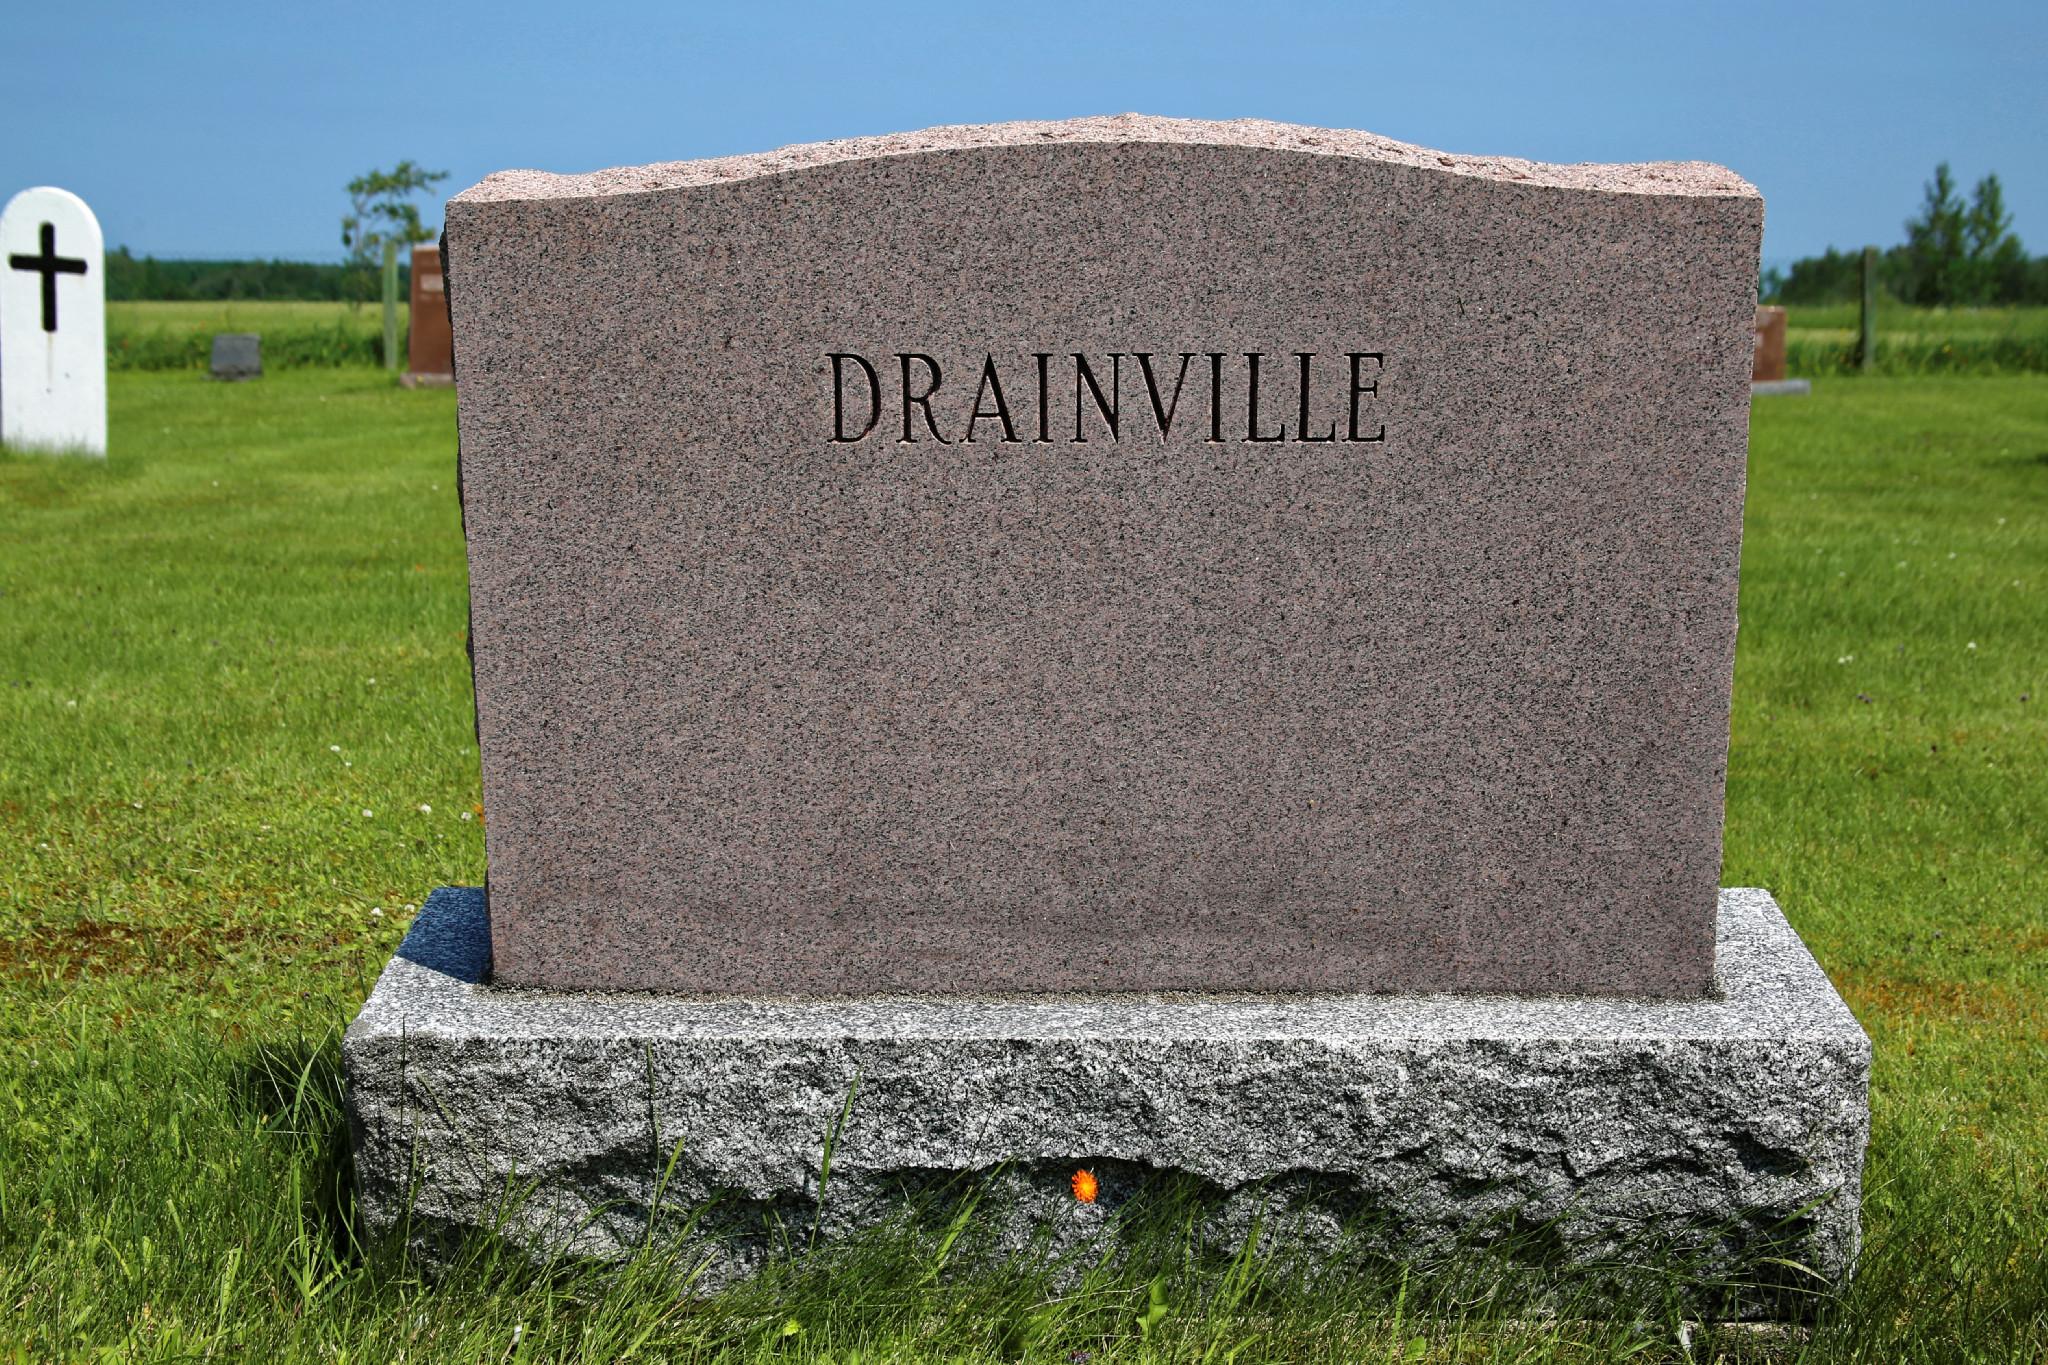 Drainville